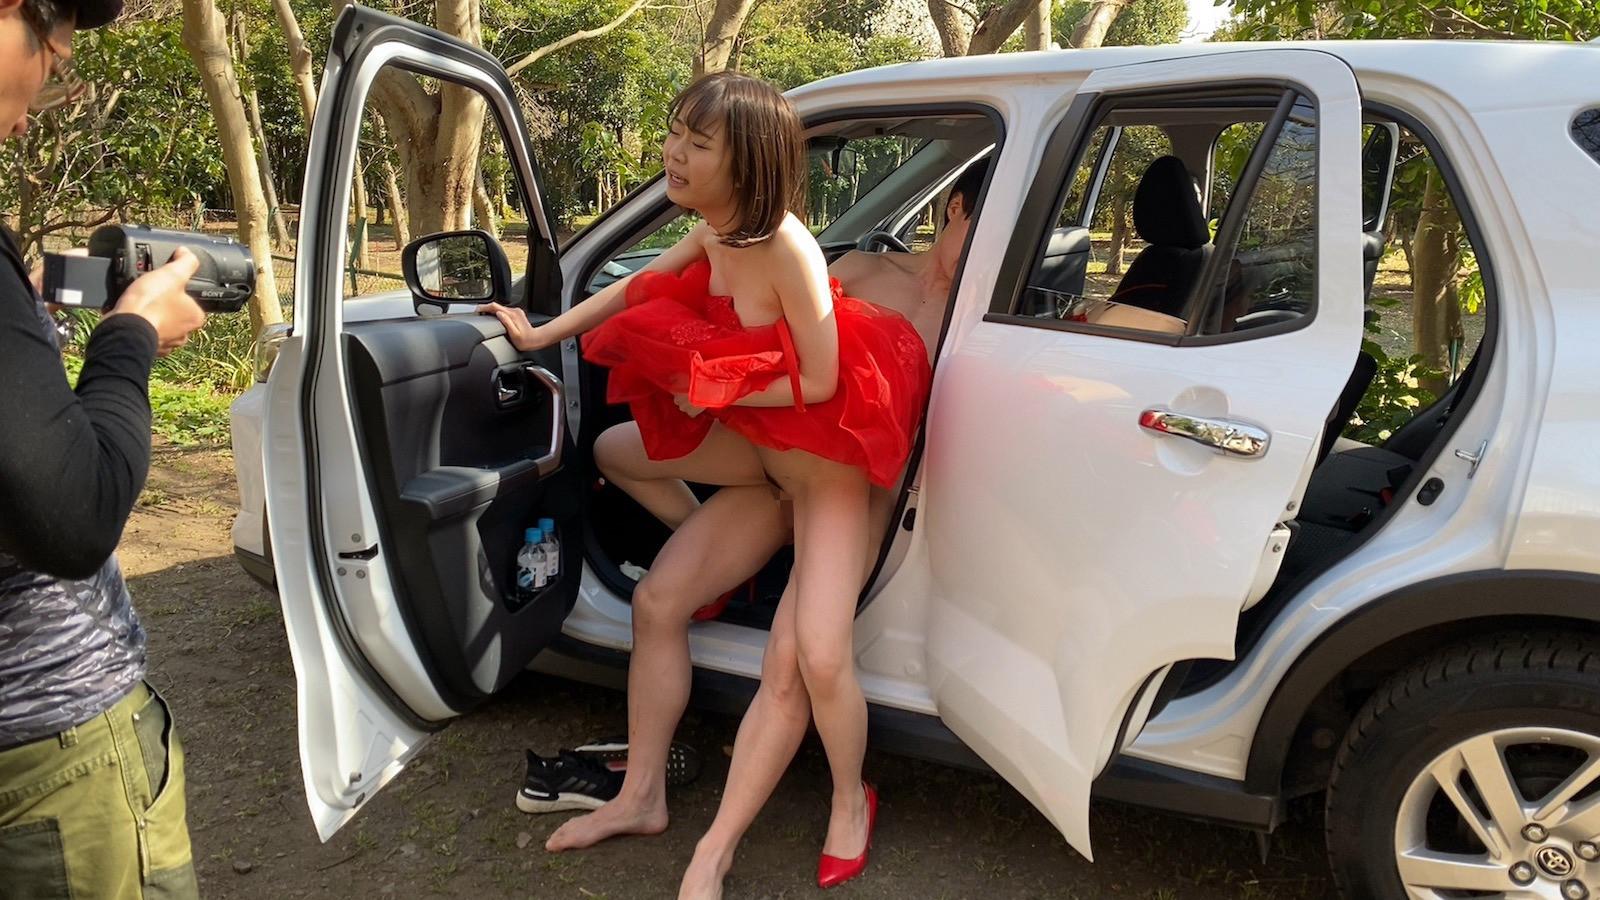 DRESS PARTY CAR SEX 渡辺まお 画像13